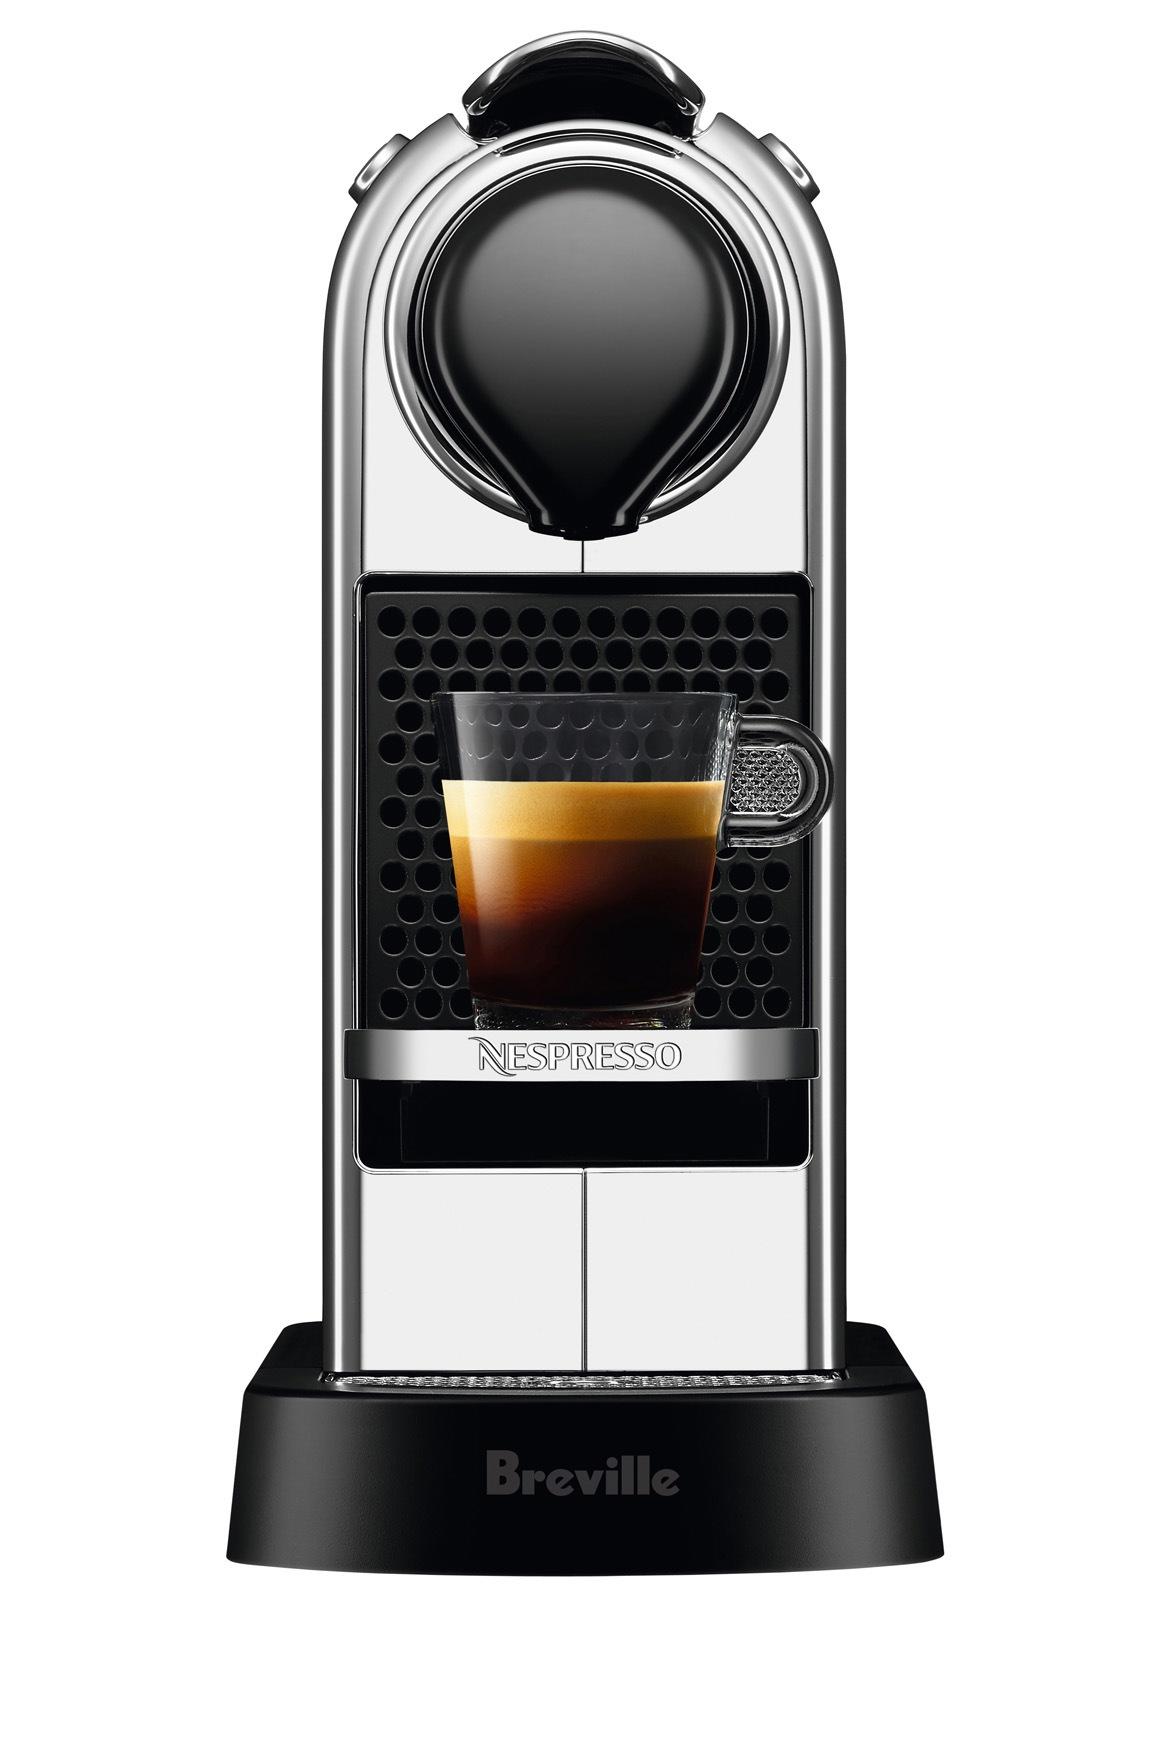 nespresso by breville bec650c citiz solo capsule coffee. Black Bedroom Furniture Sets. Home Design Ideas